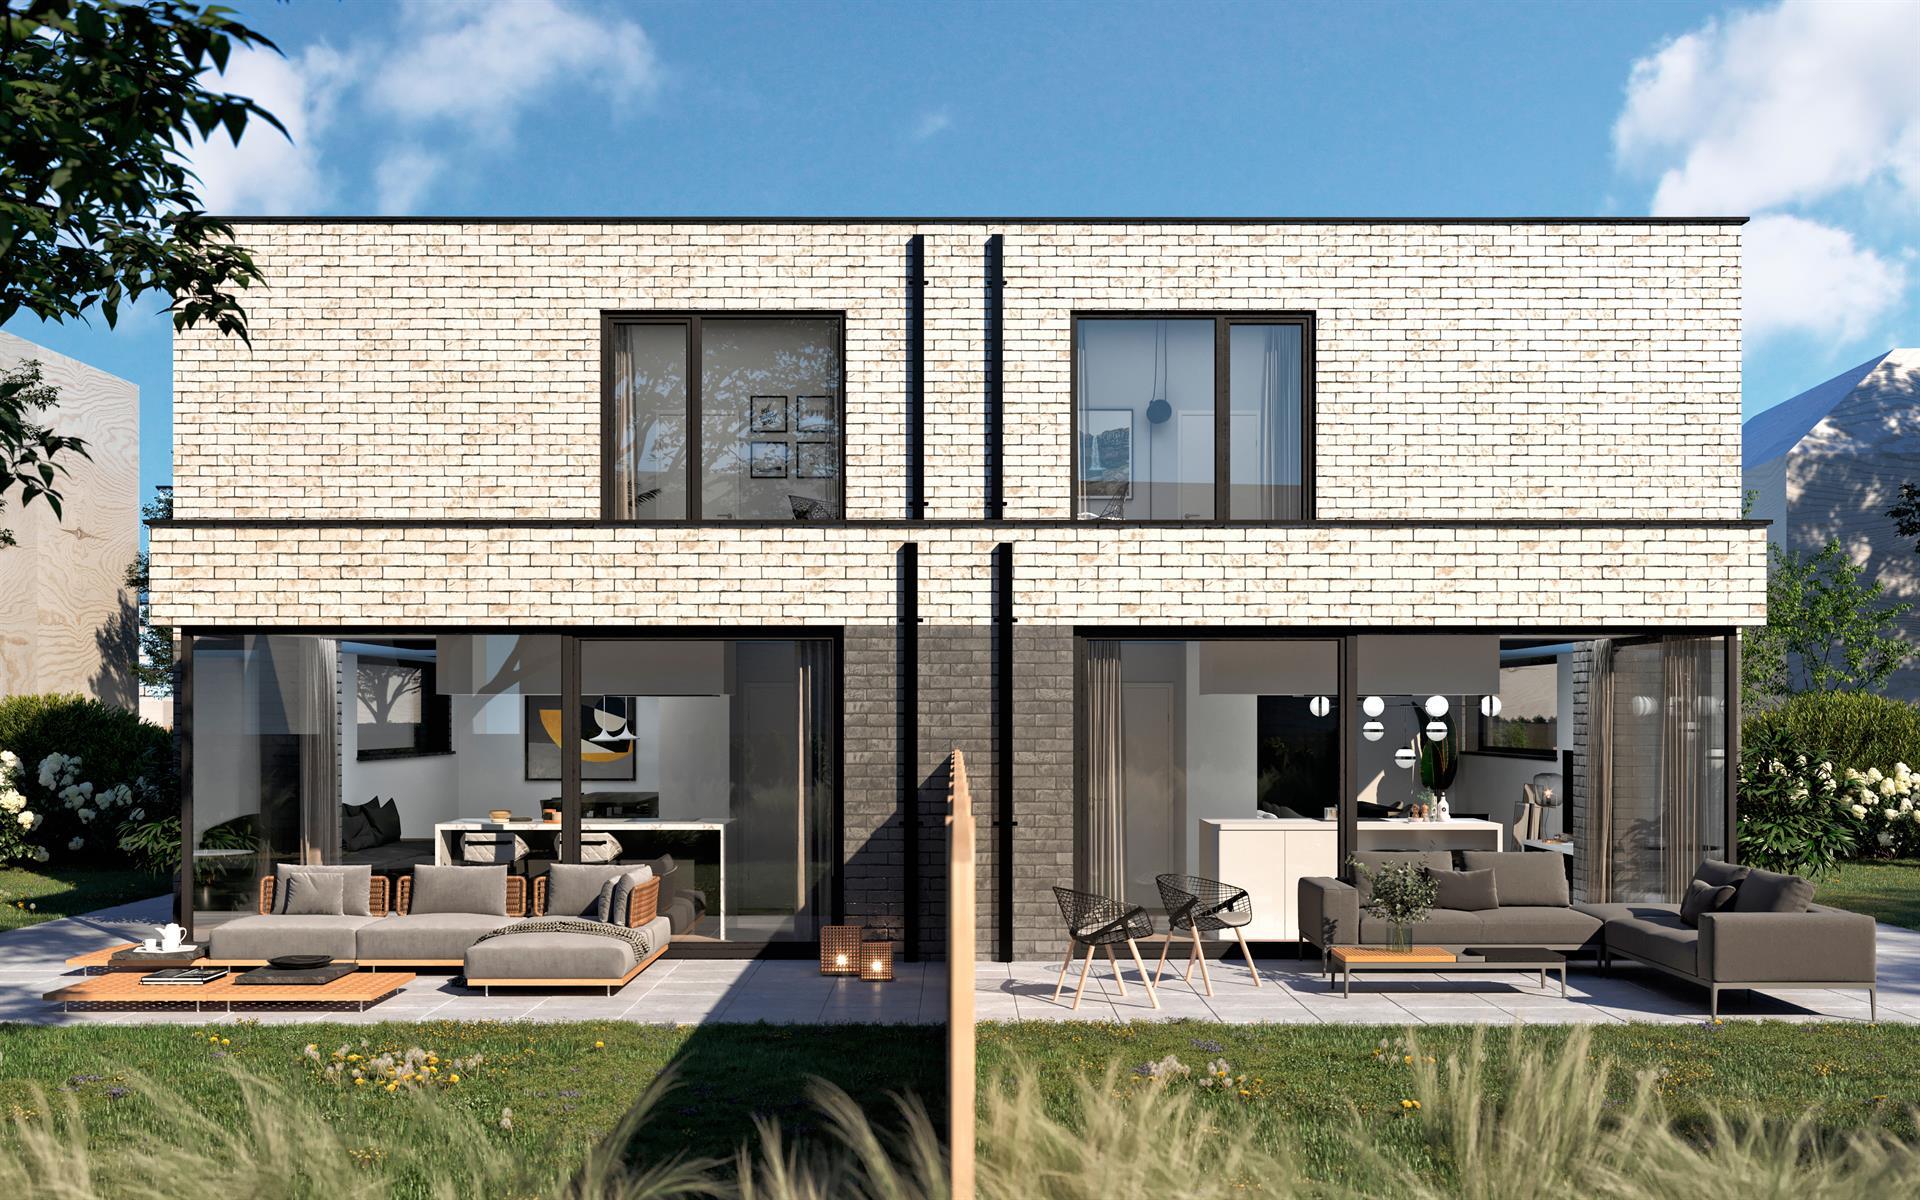 Te koop, Appartement, Gent Wondelgem, Residentie Evergreenpark - Evergemsesteenweg - Wondelgem (Gent)